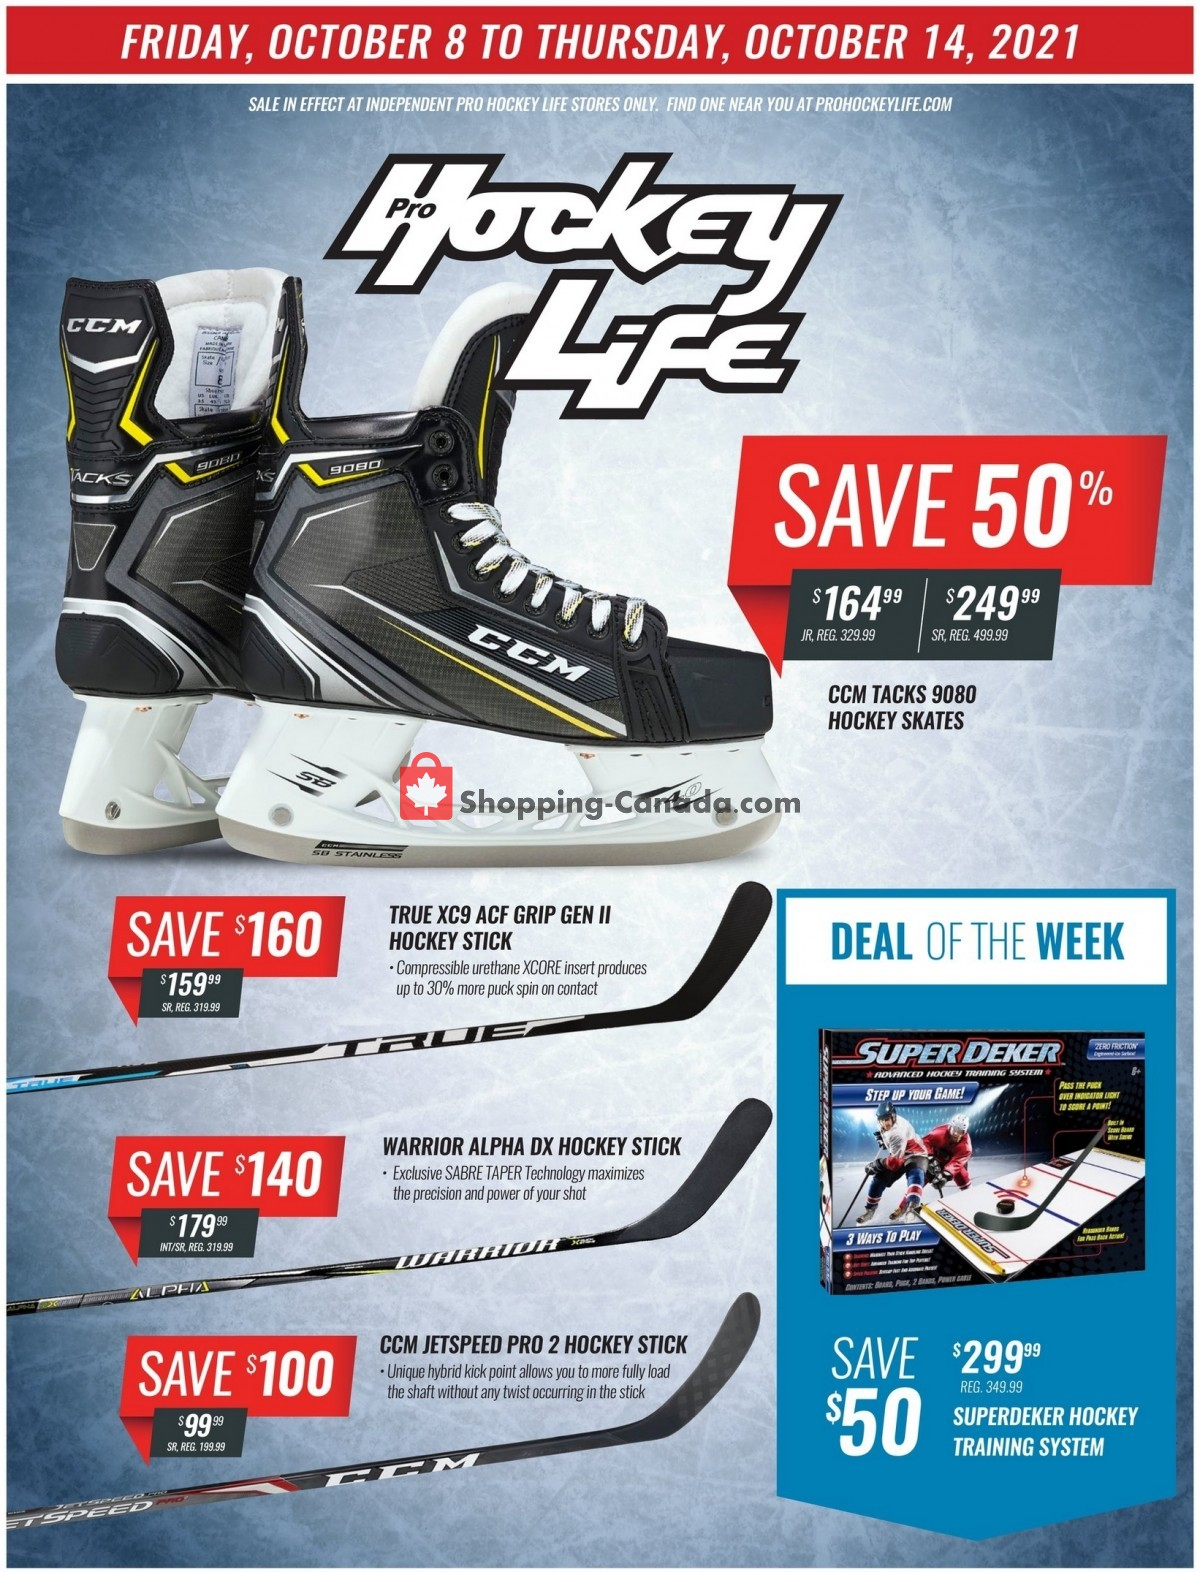 Flyer Pro Hockey Life Canada - from Friday October 8, 2021 to Thursday October 14, 2021